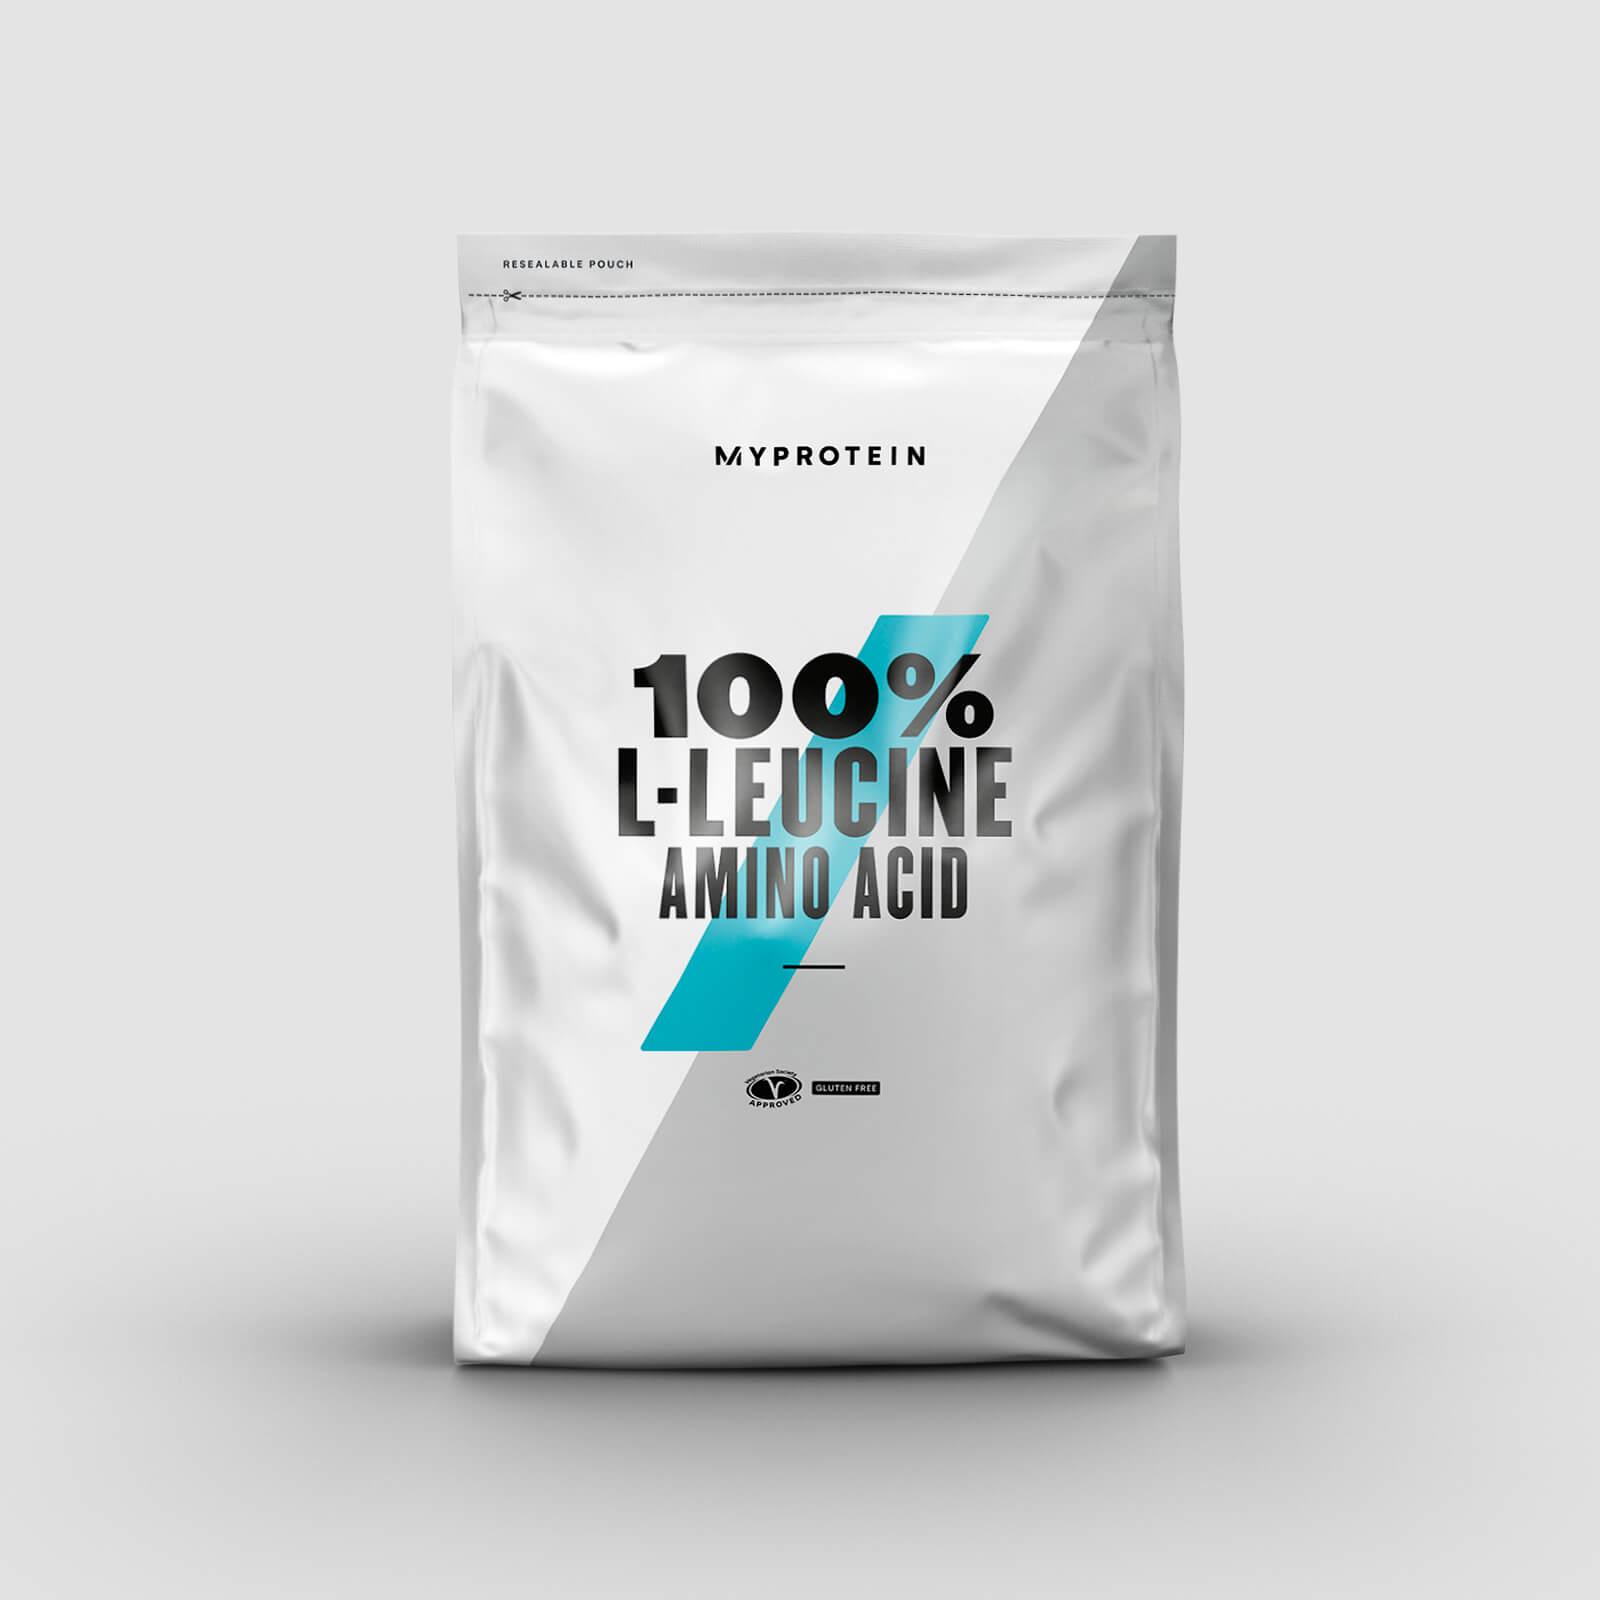 Myprotein 100% Αμινοξύ L-λευκίνης - 250g - Χωρίς Γεύση